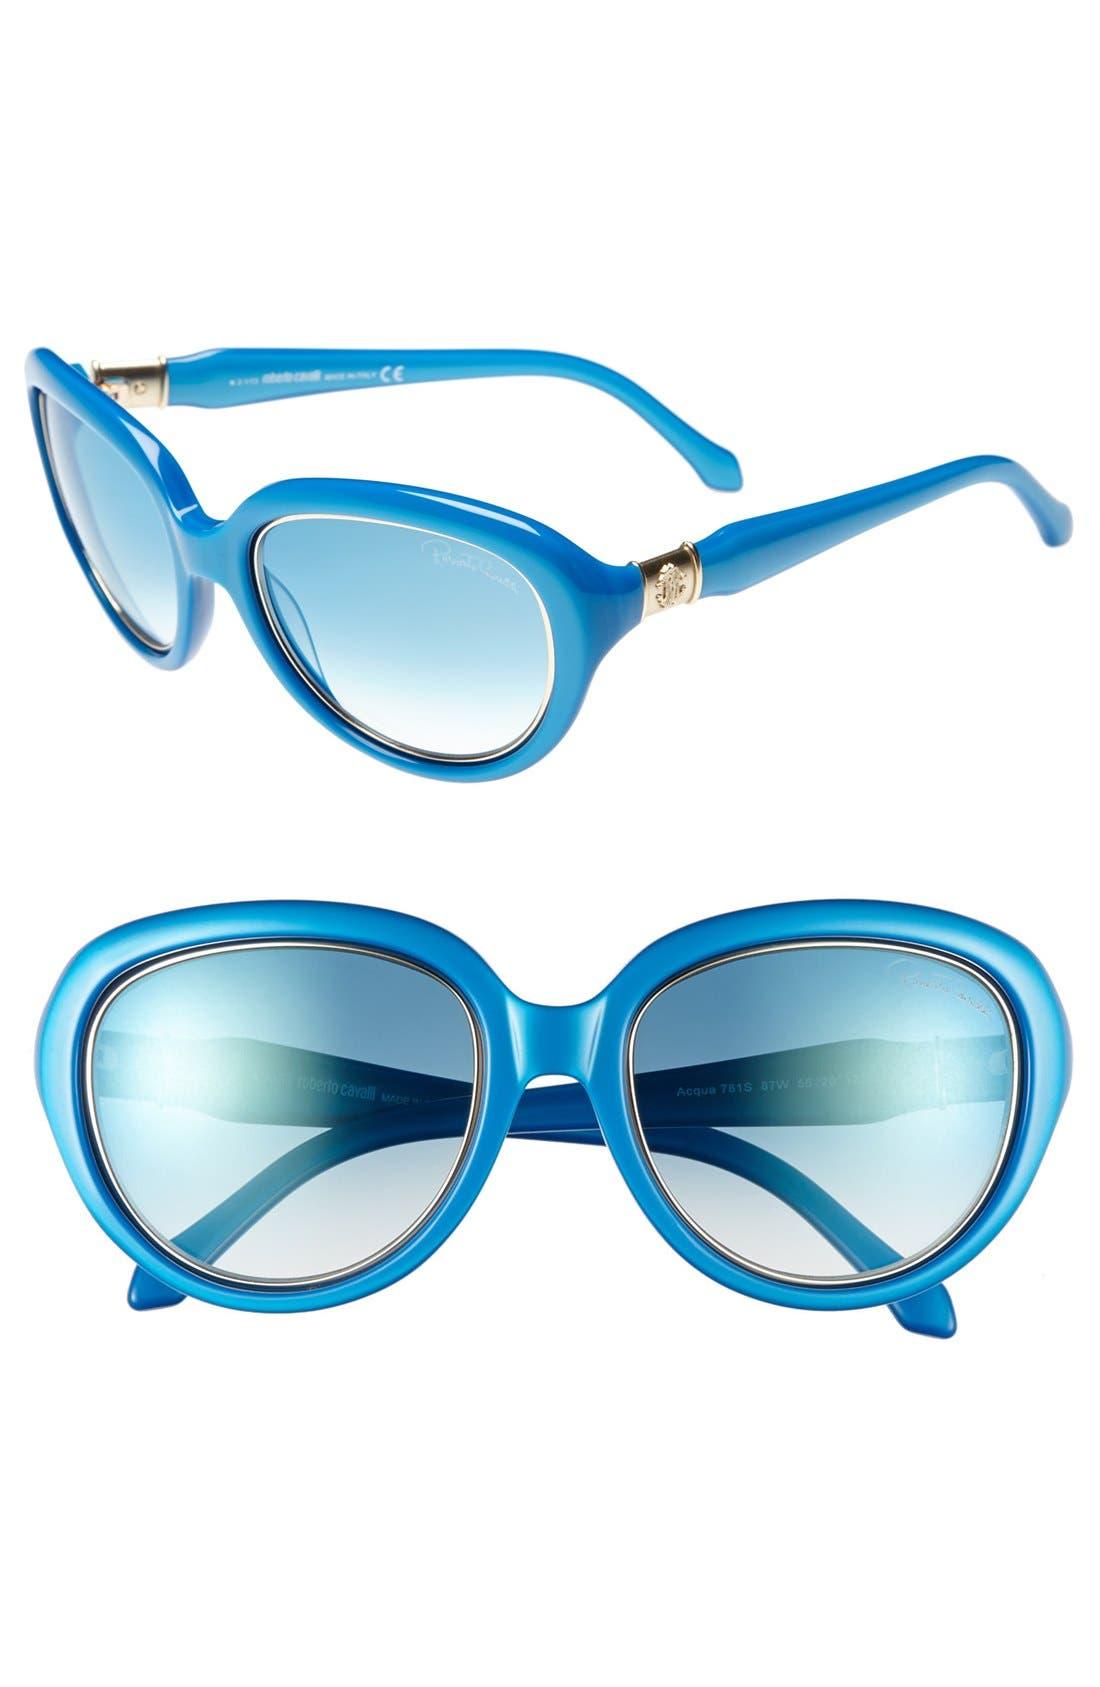 Alternate Image 1 Selected - Roberto Cavalli 'Acqua' 56mm Sunglasses